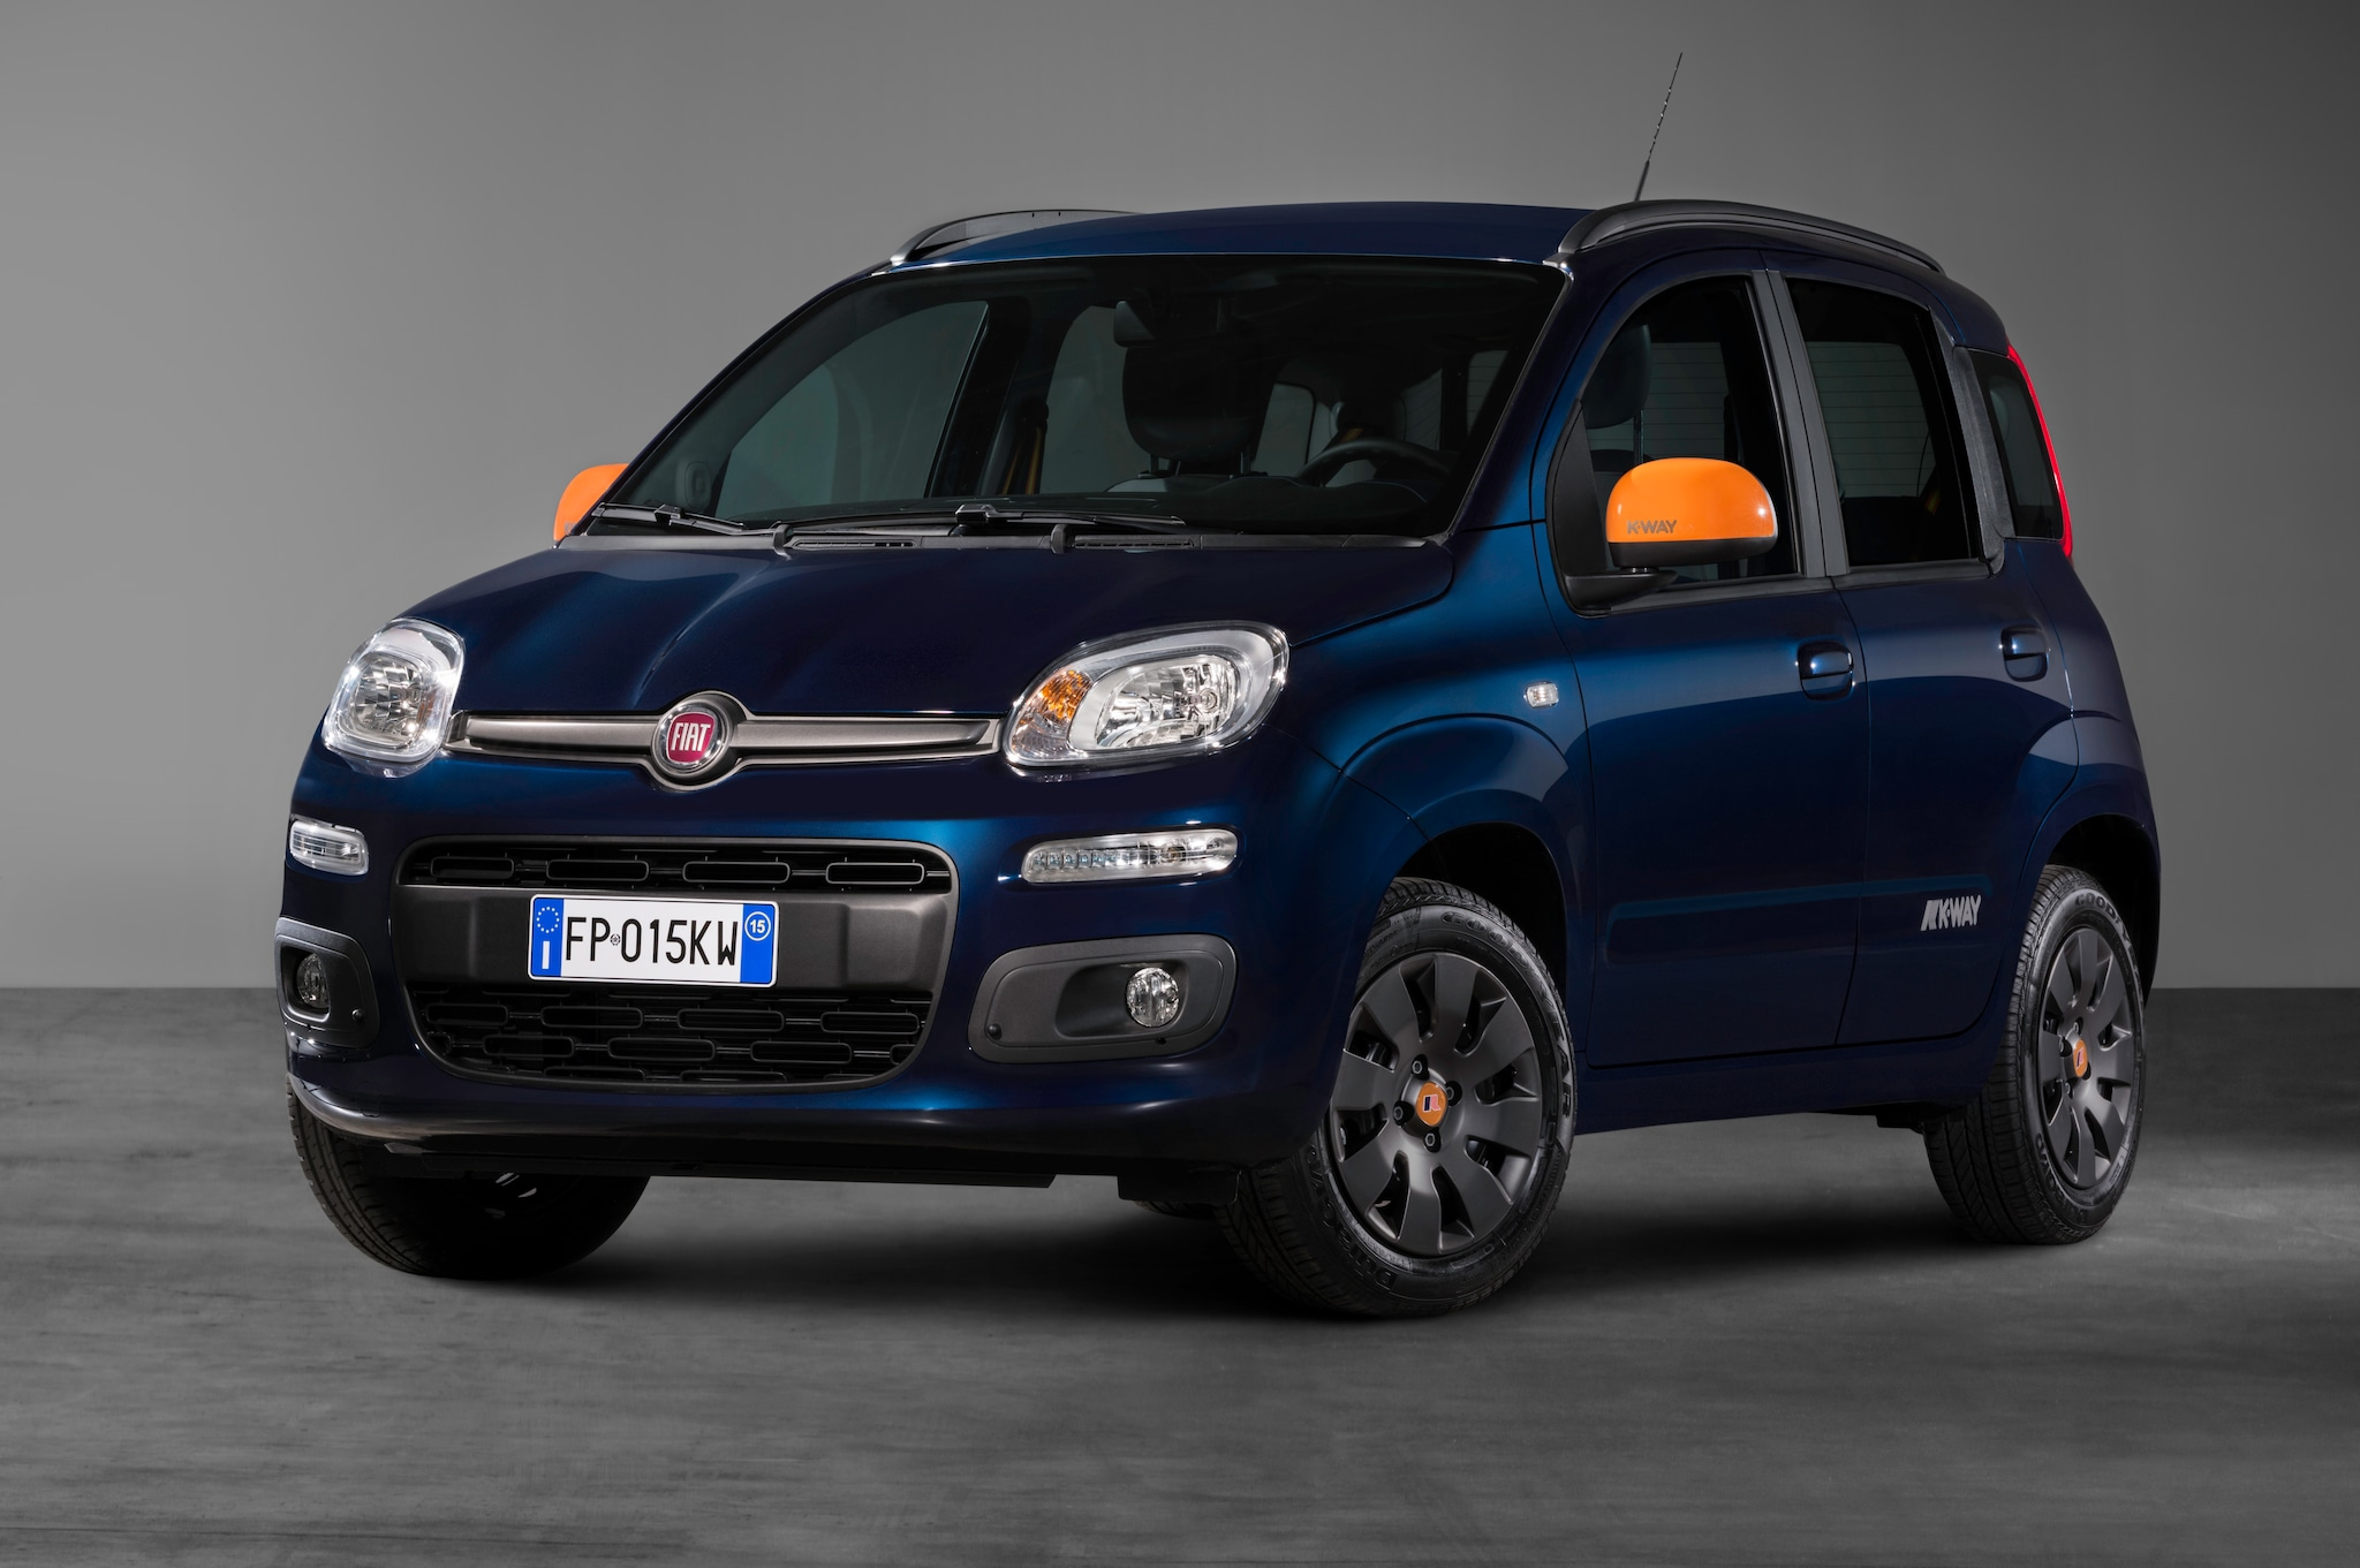 The new Fiat Panda K-Way® seen in the heart of Milan